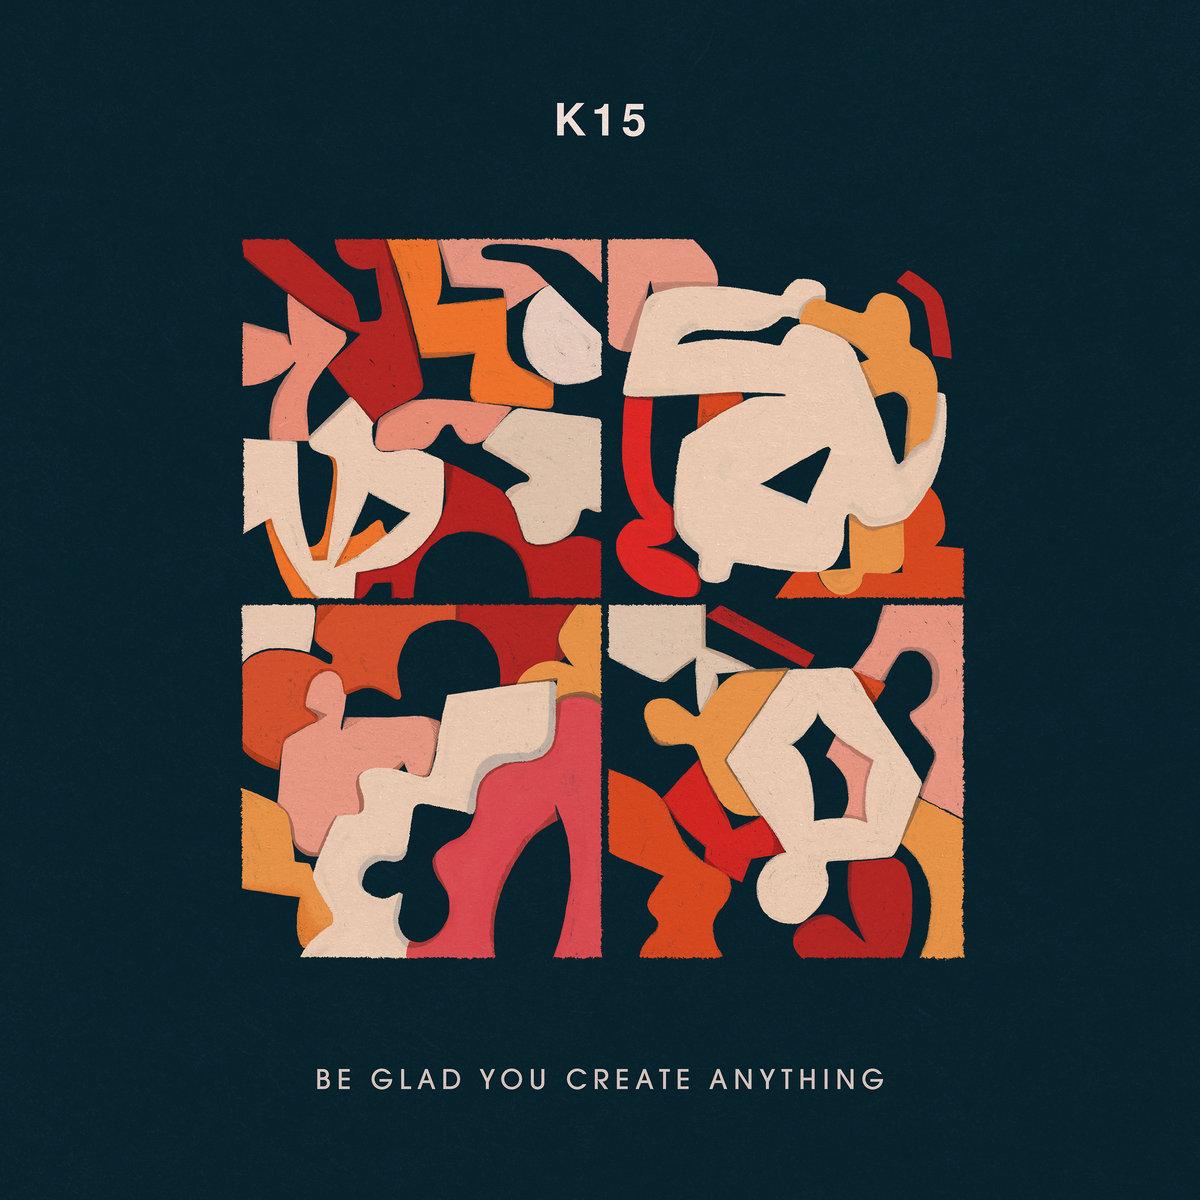 Be glad you create anything k15 by k15 altavistaventures Gallery